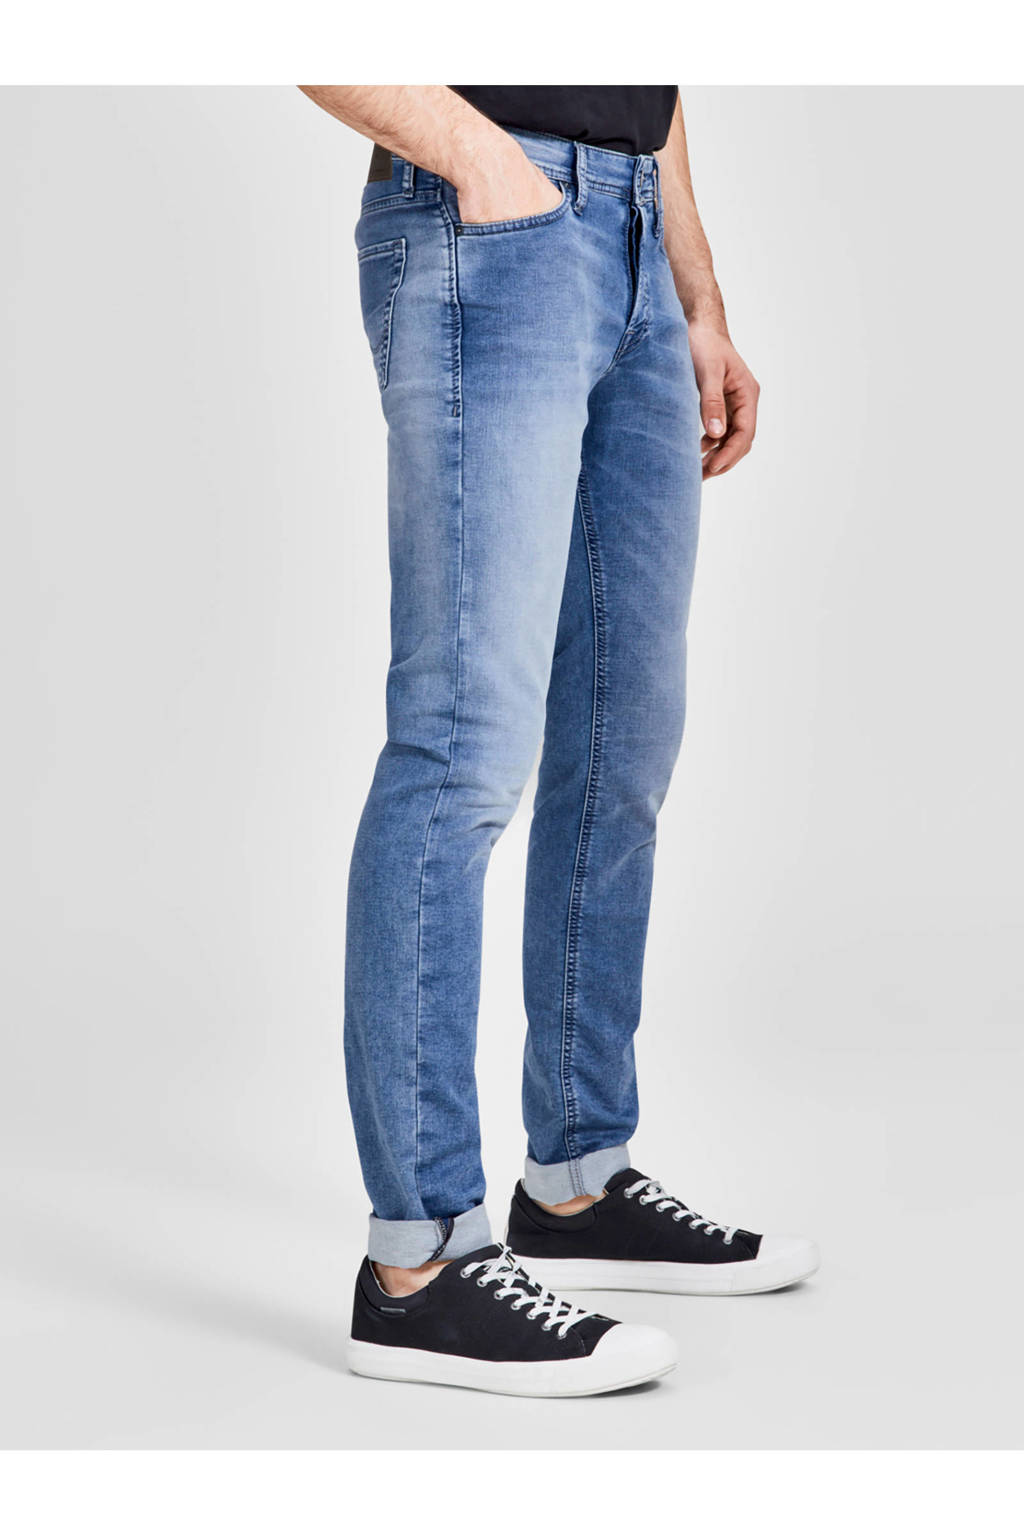 JACK & JONES JEANS INTELLIGENCE slim fit jeans Glenn, Light denim